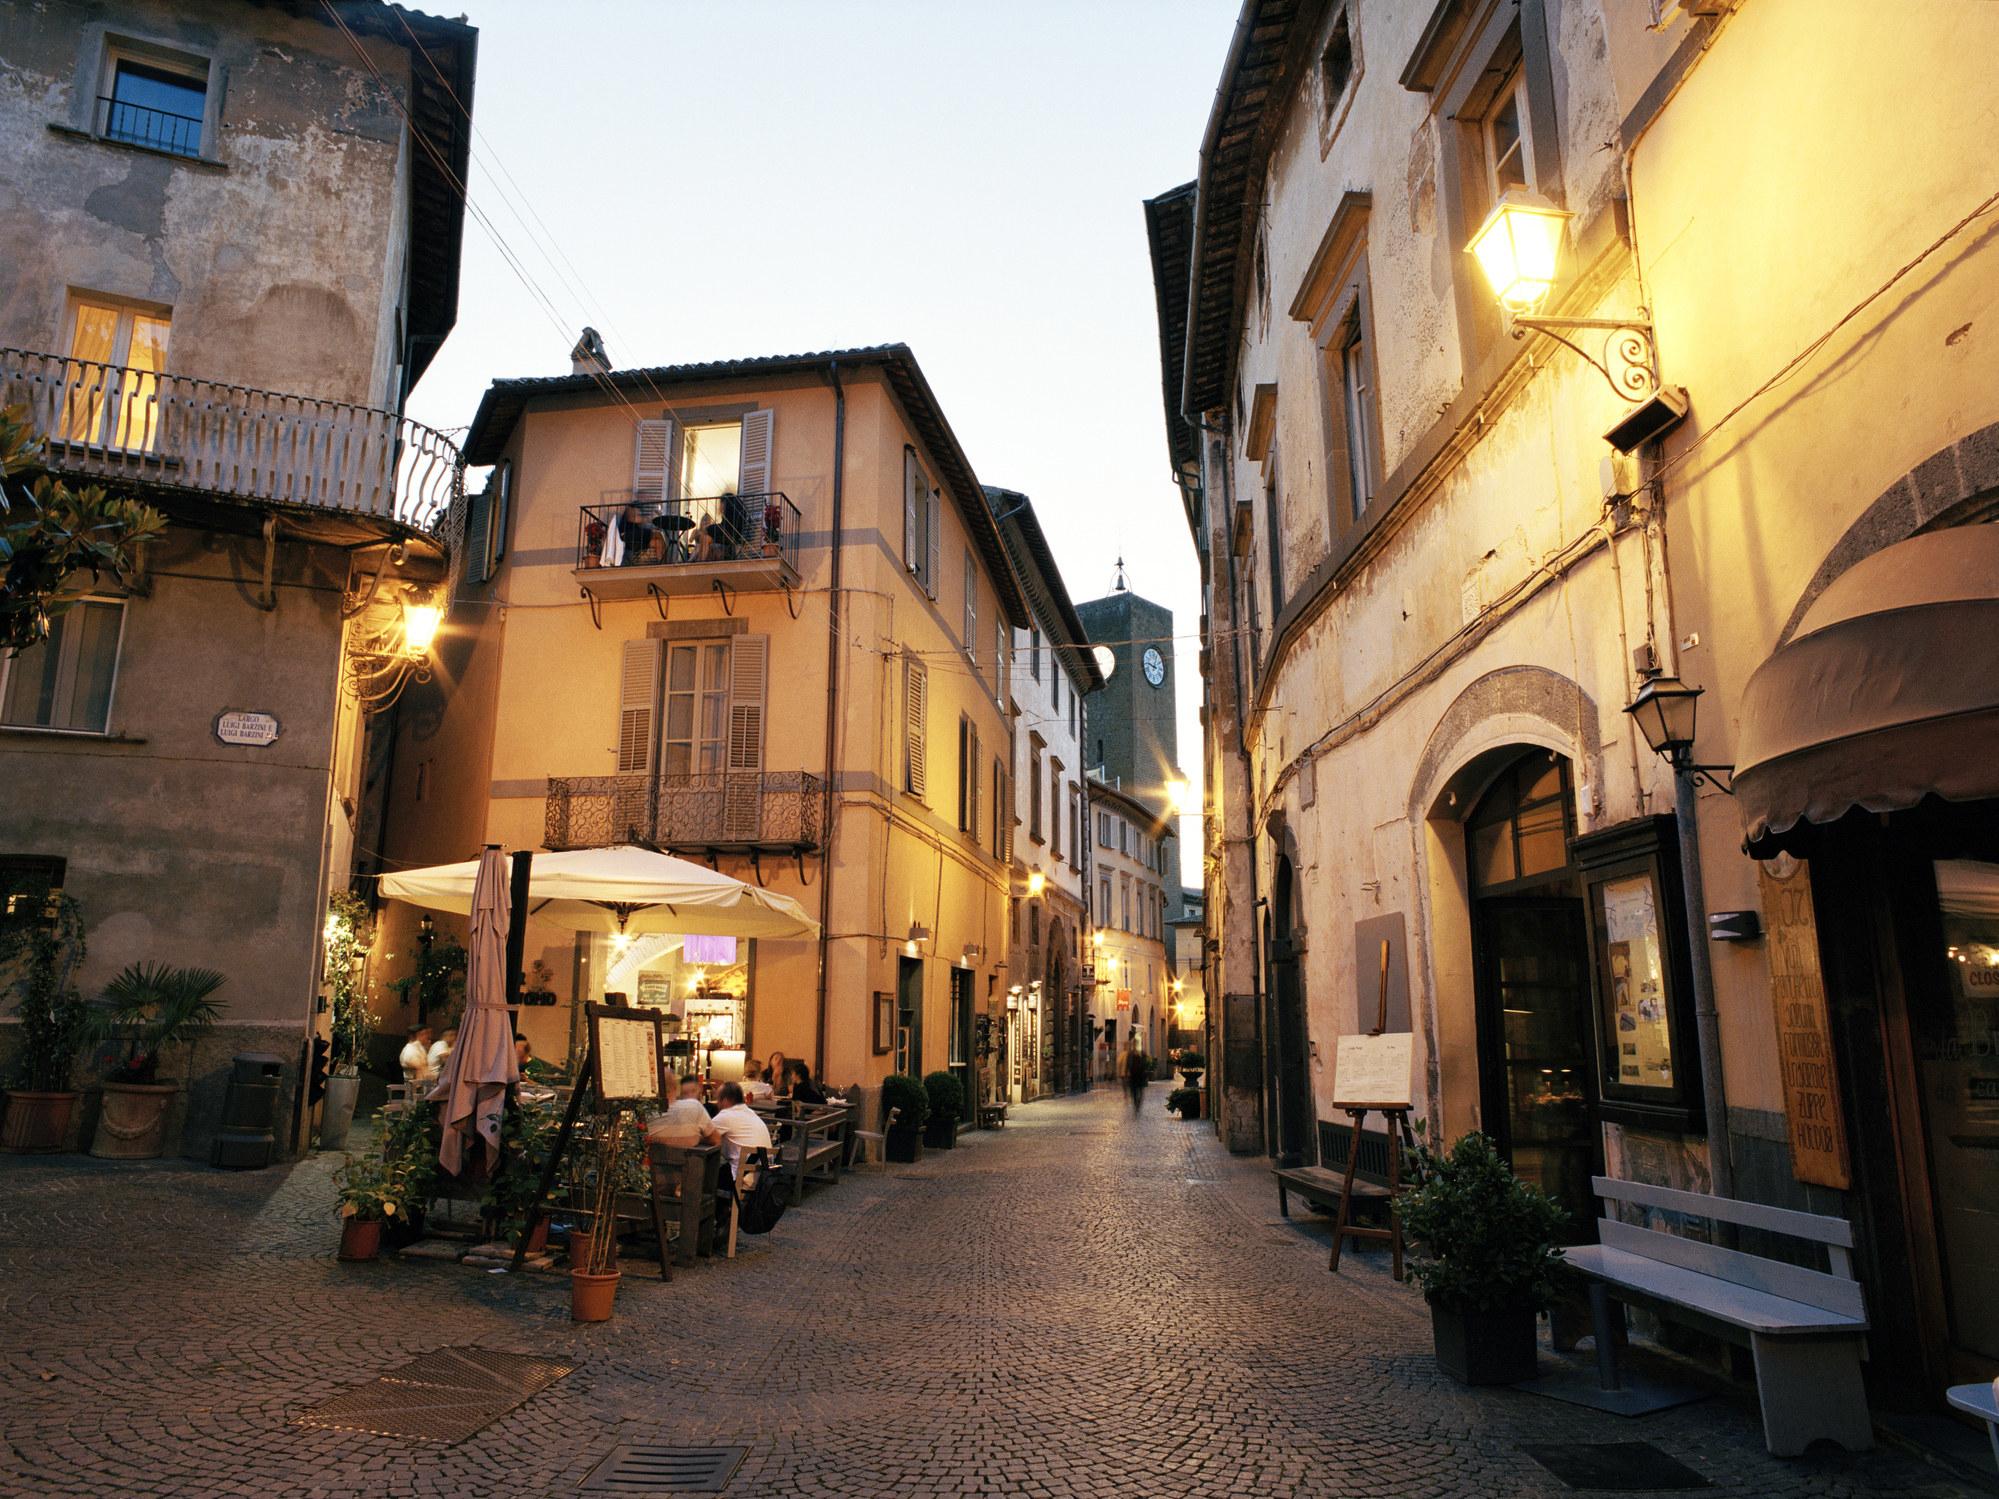 A quiet street in Orvieto.